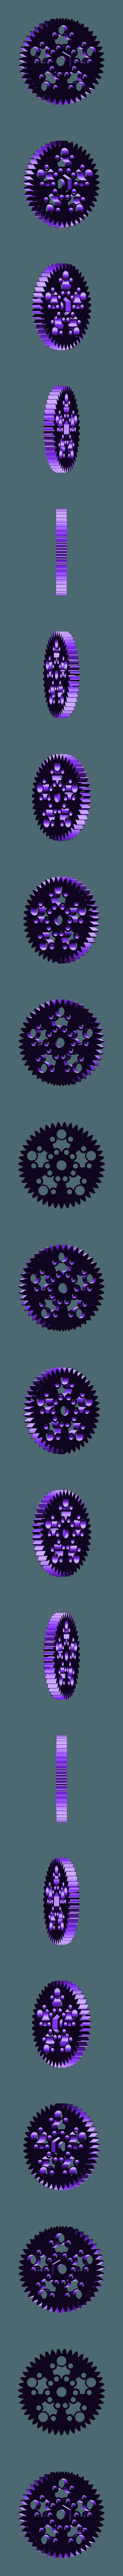 big_gear.stl Download free STL file Geared Extruder 2 • Design to 3D print, Job